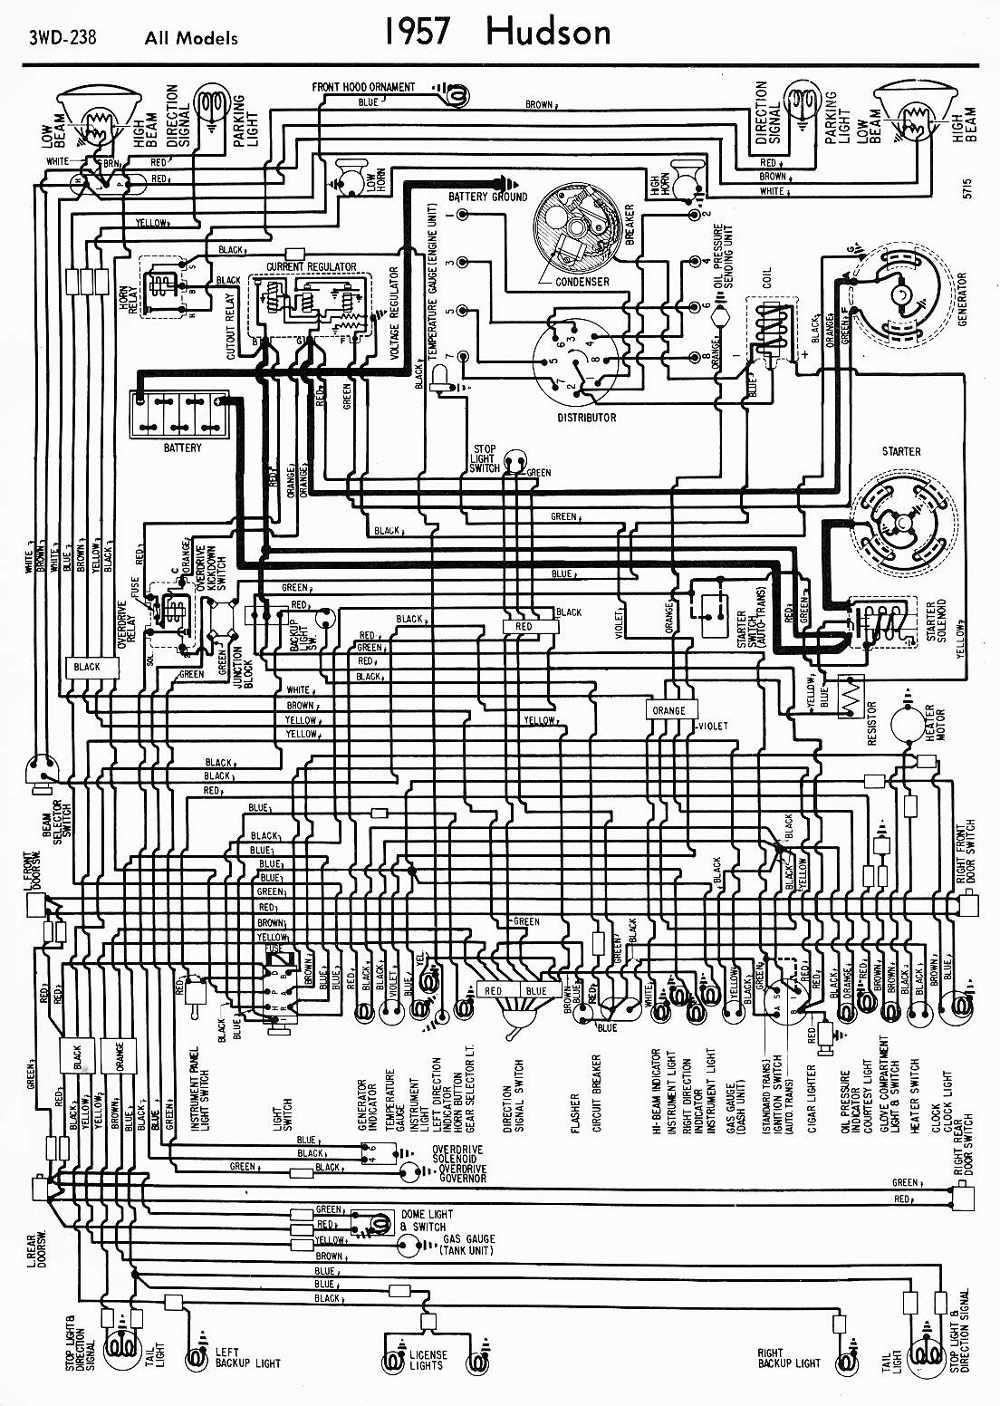 Modern Rcd33la Diagram Festooning - Electrical Diagram Ideas - itseo ...